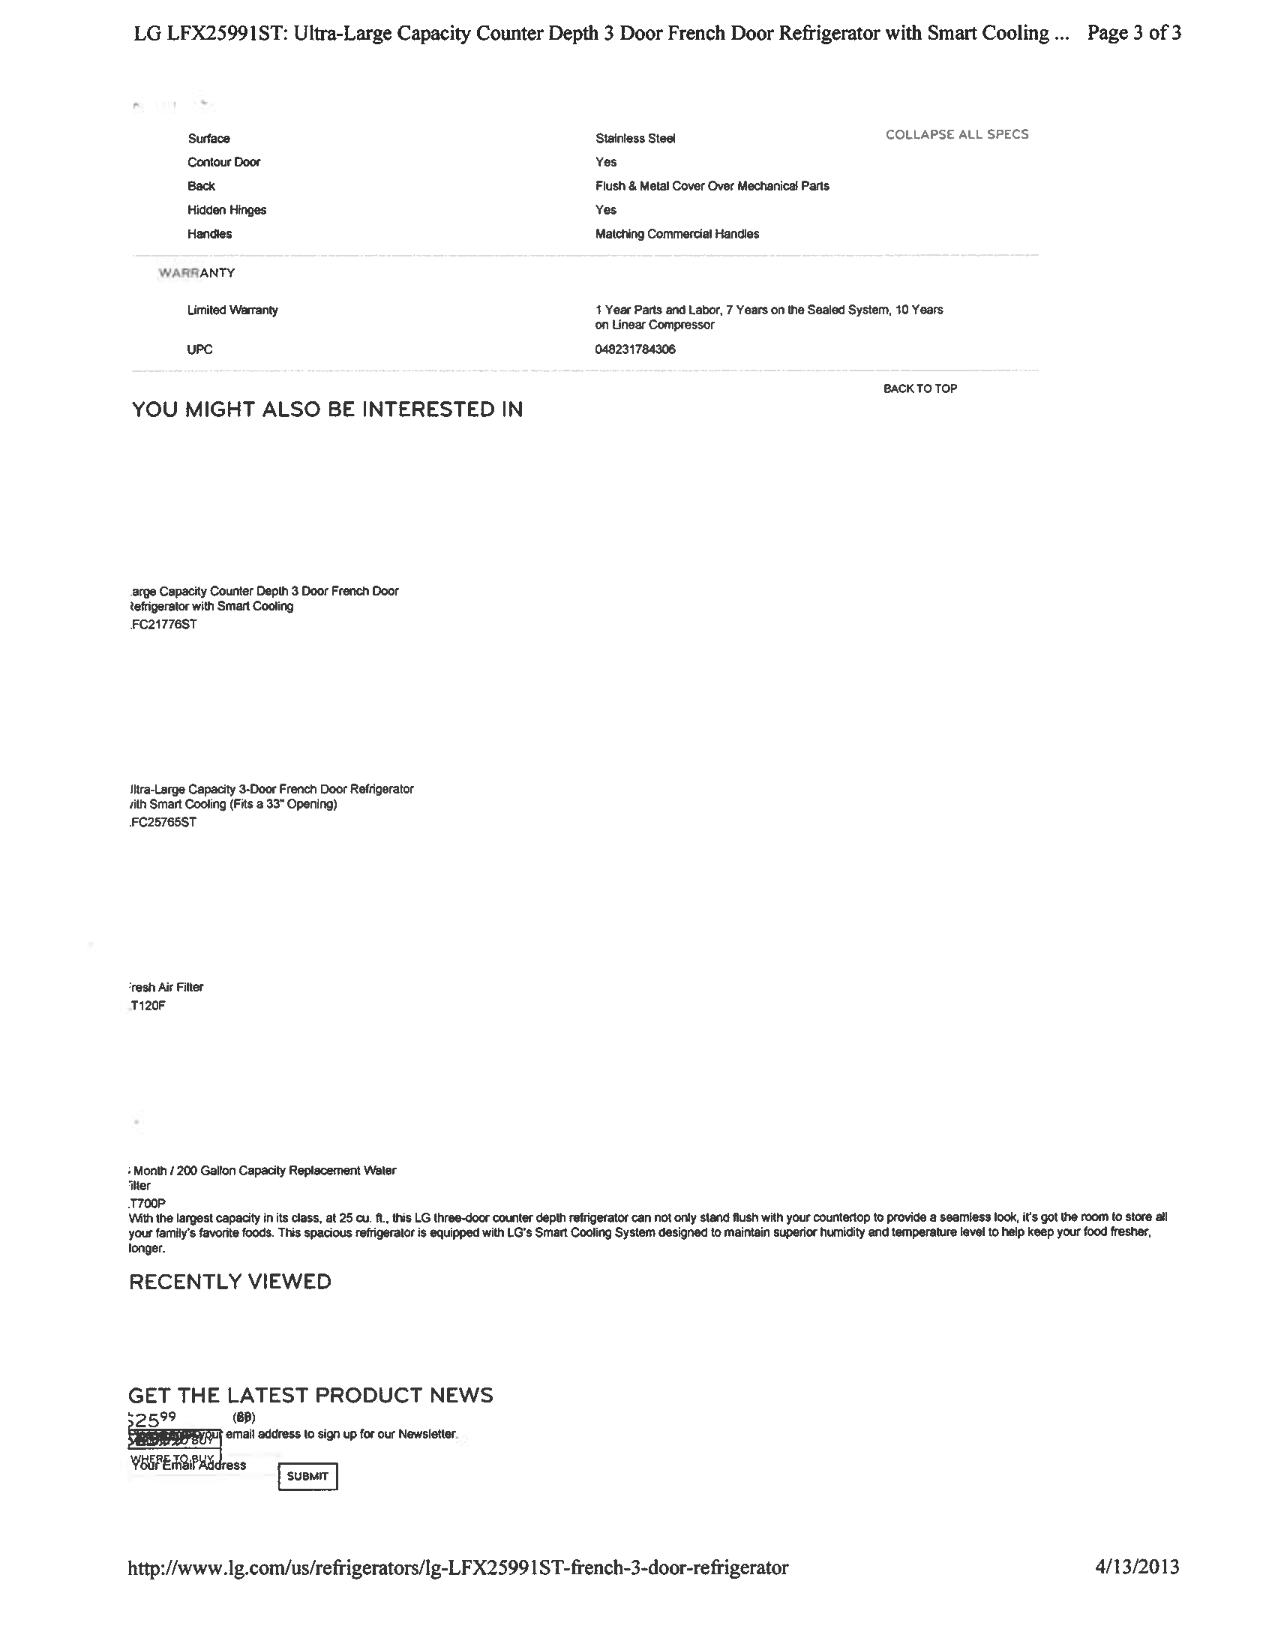 PDF manual for LG Refrigerator LFX25991ST